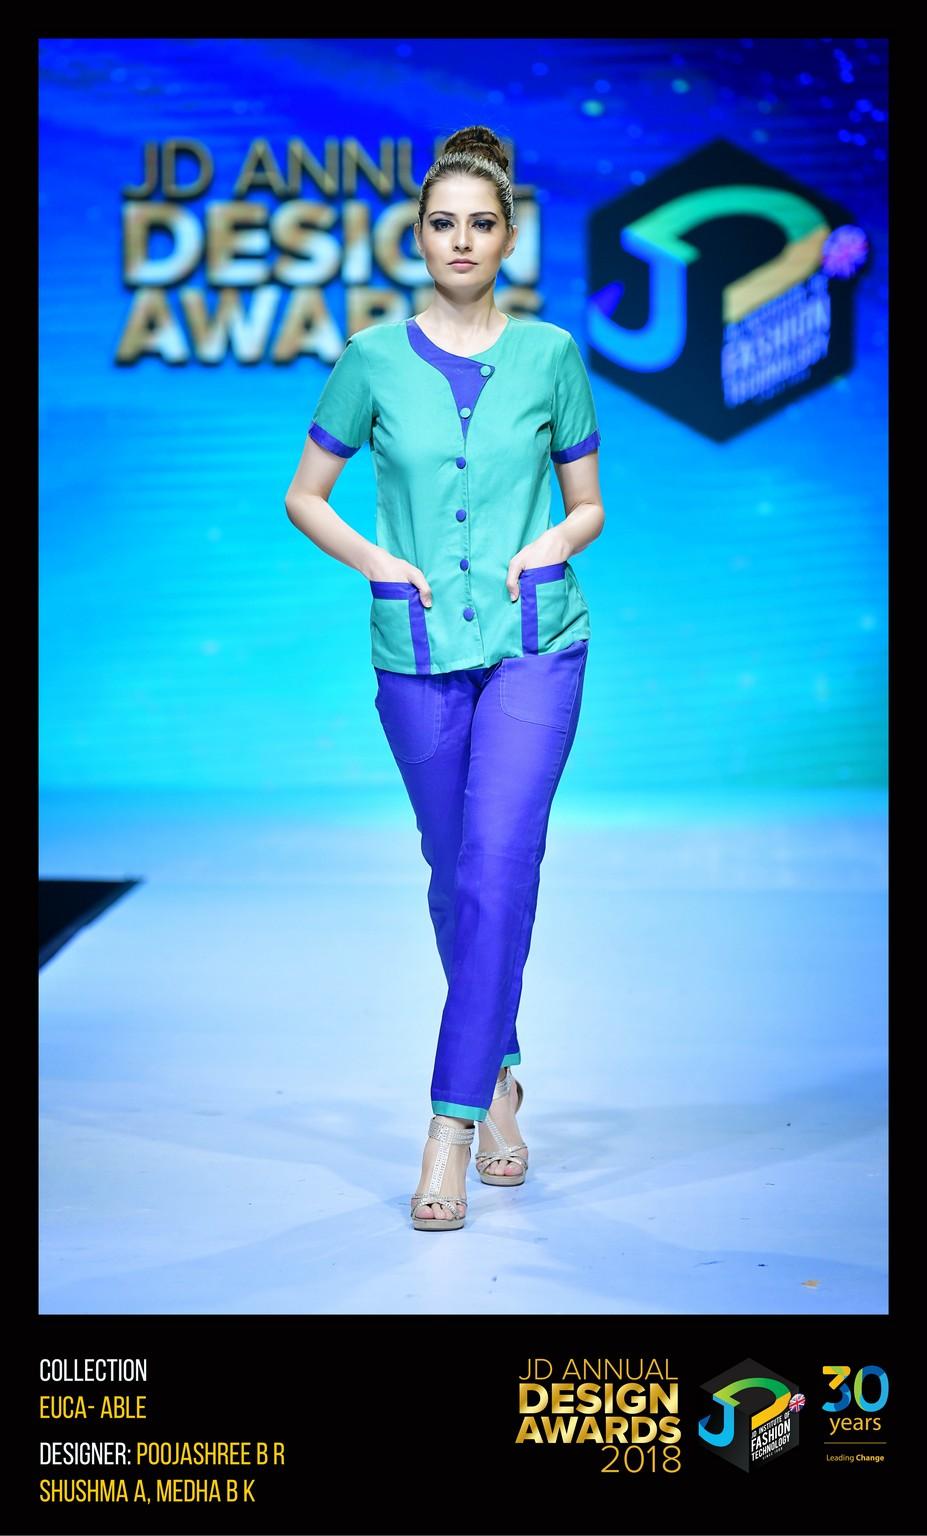 Euca-able – Change – JD Annual Design Awards 2018 | Designer: Poojashree, Sushma and Medha | Photography : Jerin Nath (@jerin_nath) euca-able - EUCA ABLE 5 - Euca-able – Change – JD Annual Design Awards 2018